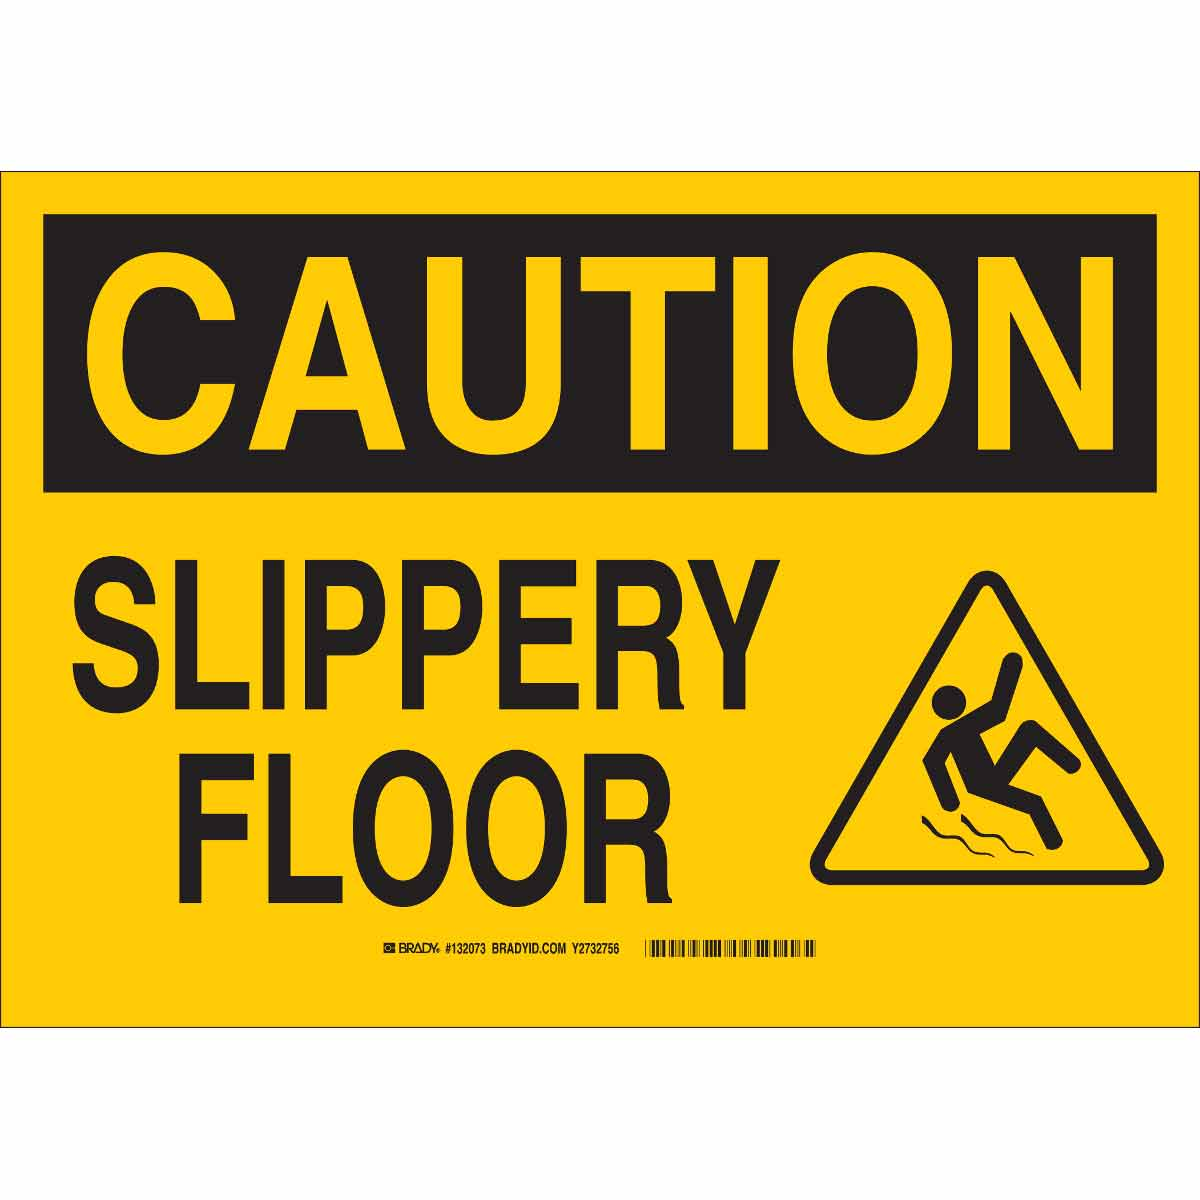 Brady part 132075 caution slippery floor sign for Floor banner